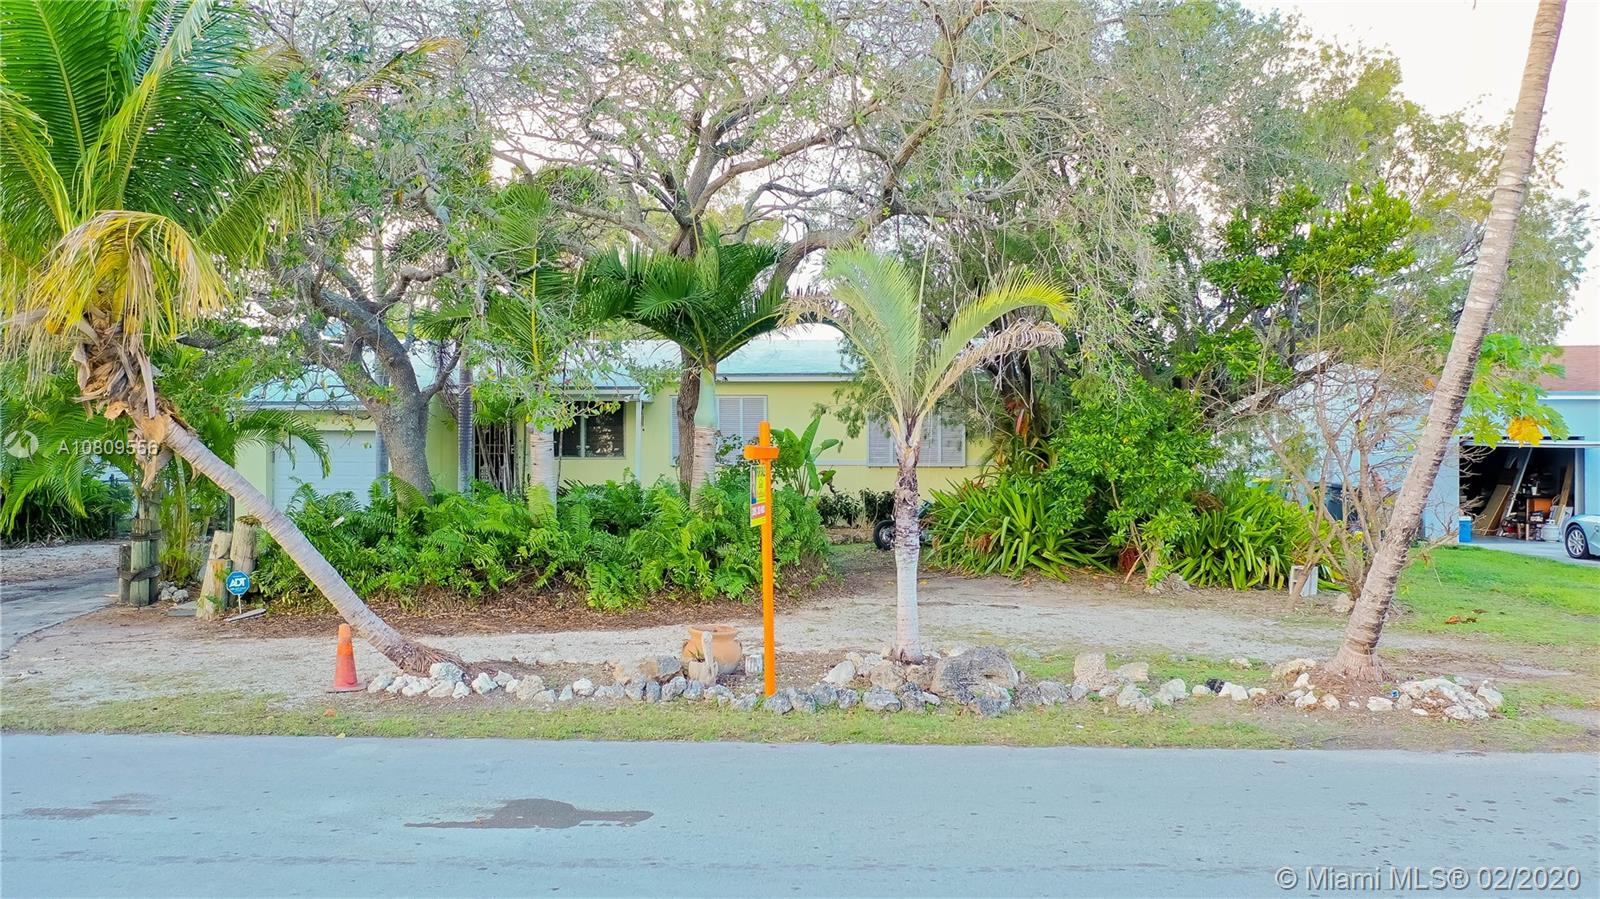 445 NW 11 St, Homestead, FL 33030 - Homestead, FL real estate listing